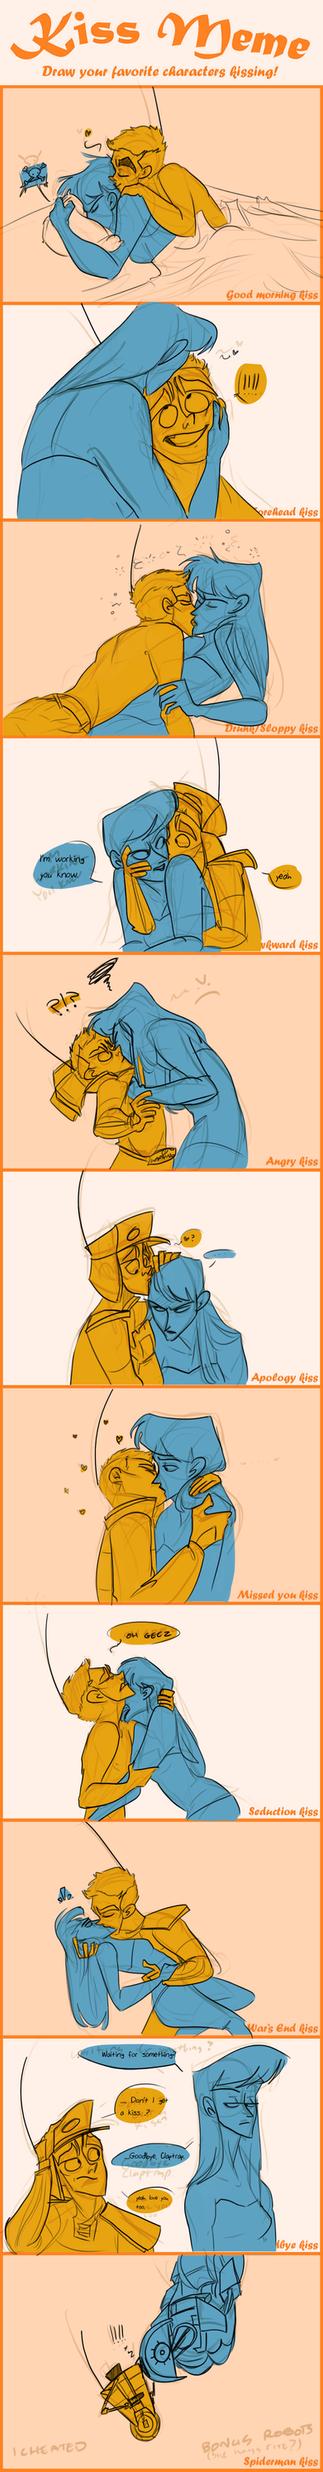 Stupid dumb idiot kiss meme ClapDOS by Wolf-Shadow77